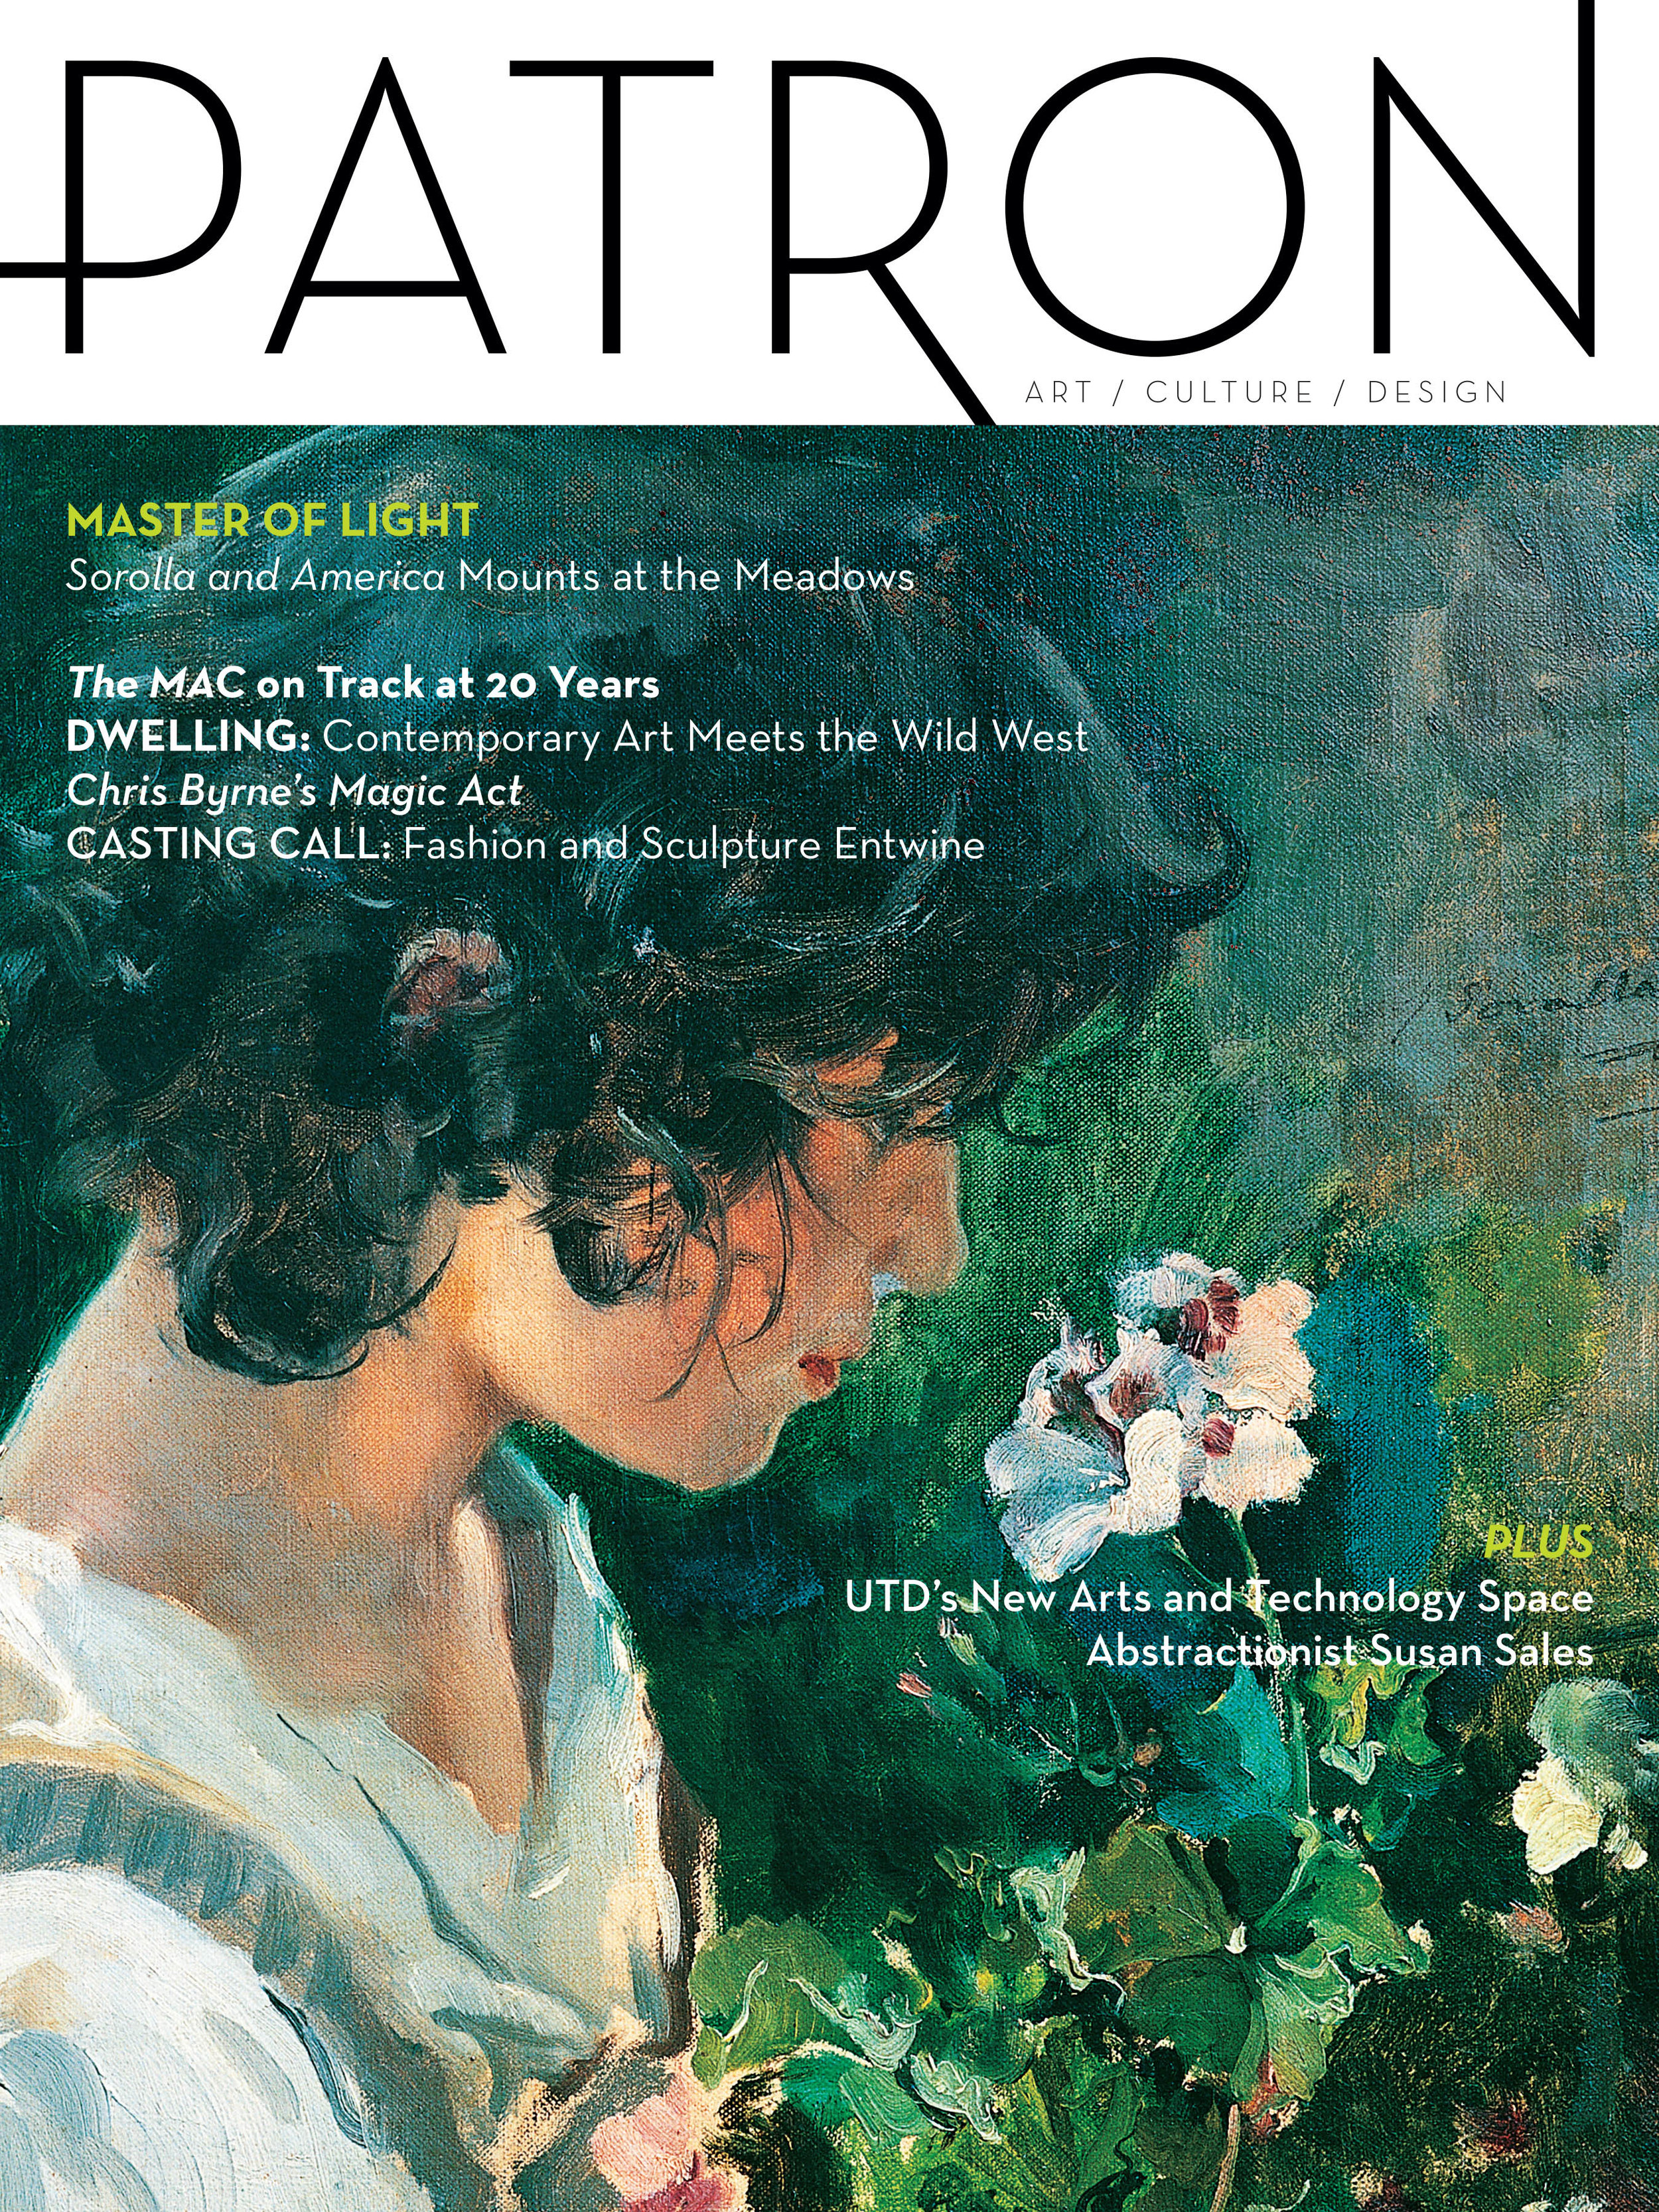 Patron Cover Dec-January 2014.jpg